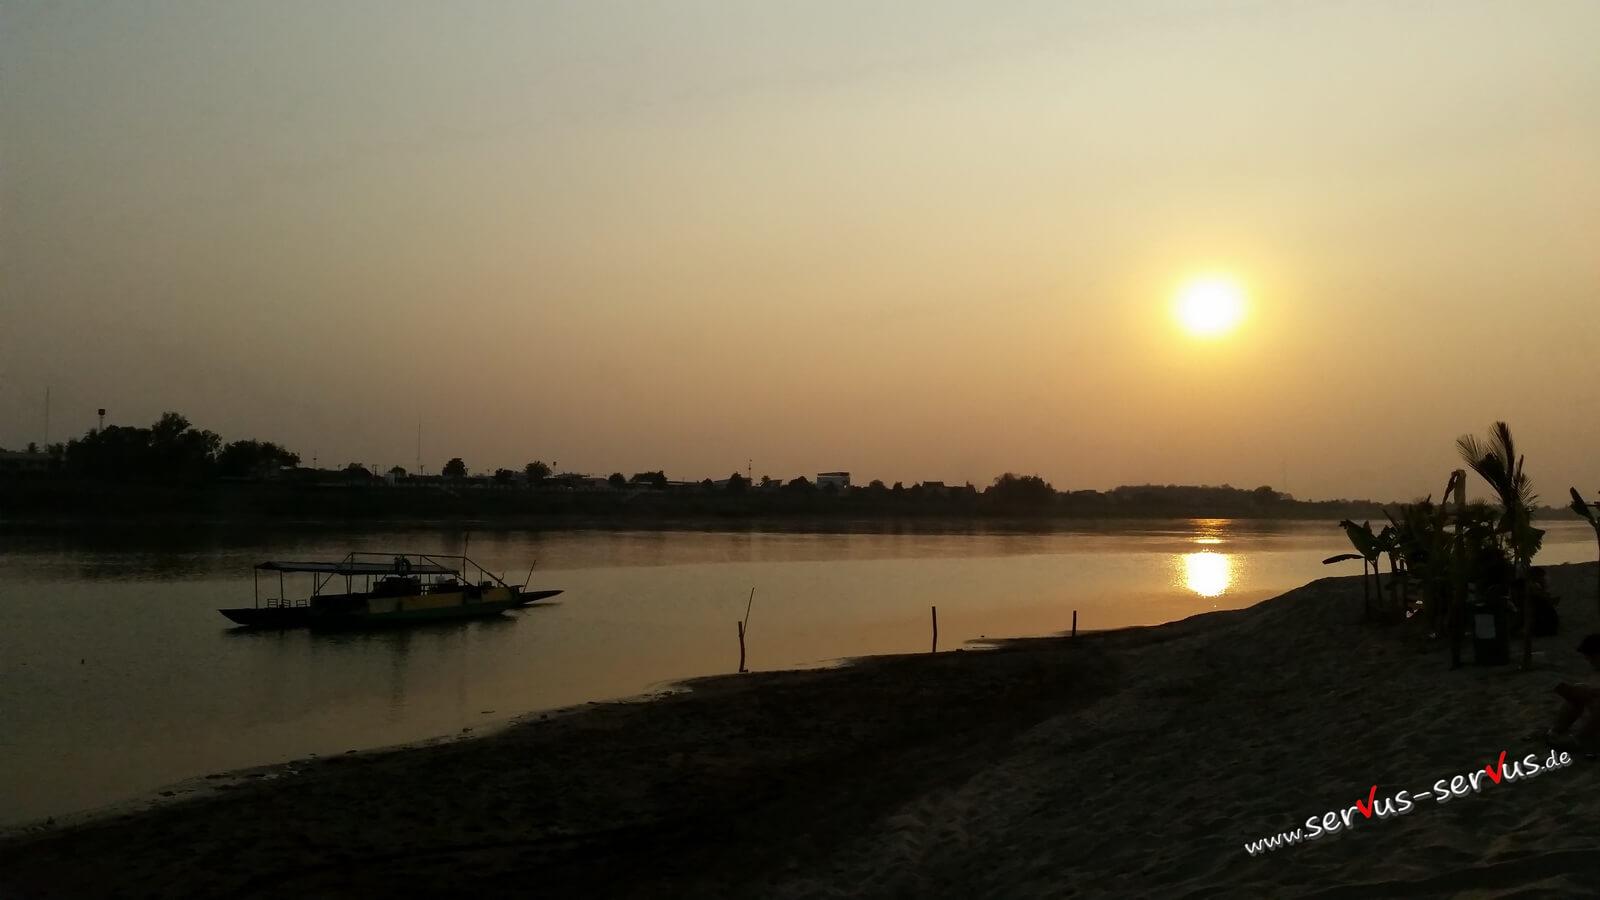 sonnenuntergang, mekong, laos, vientiane